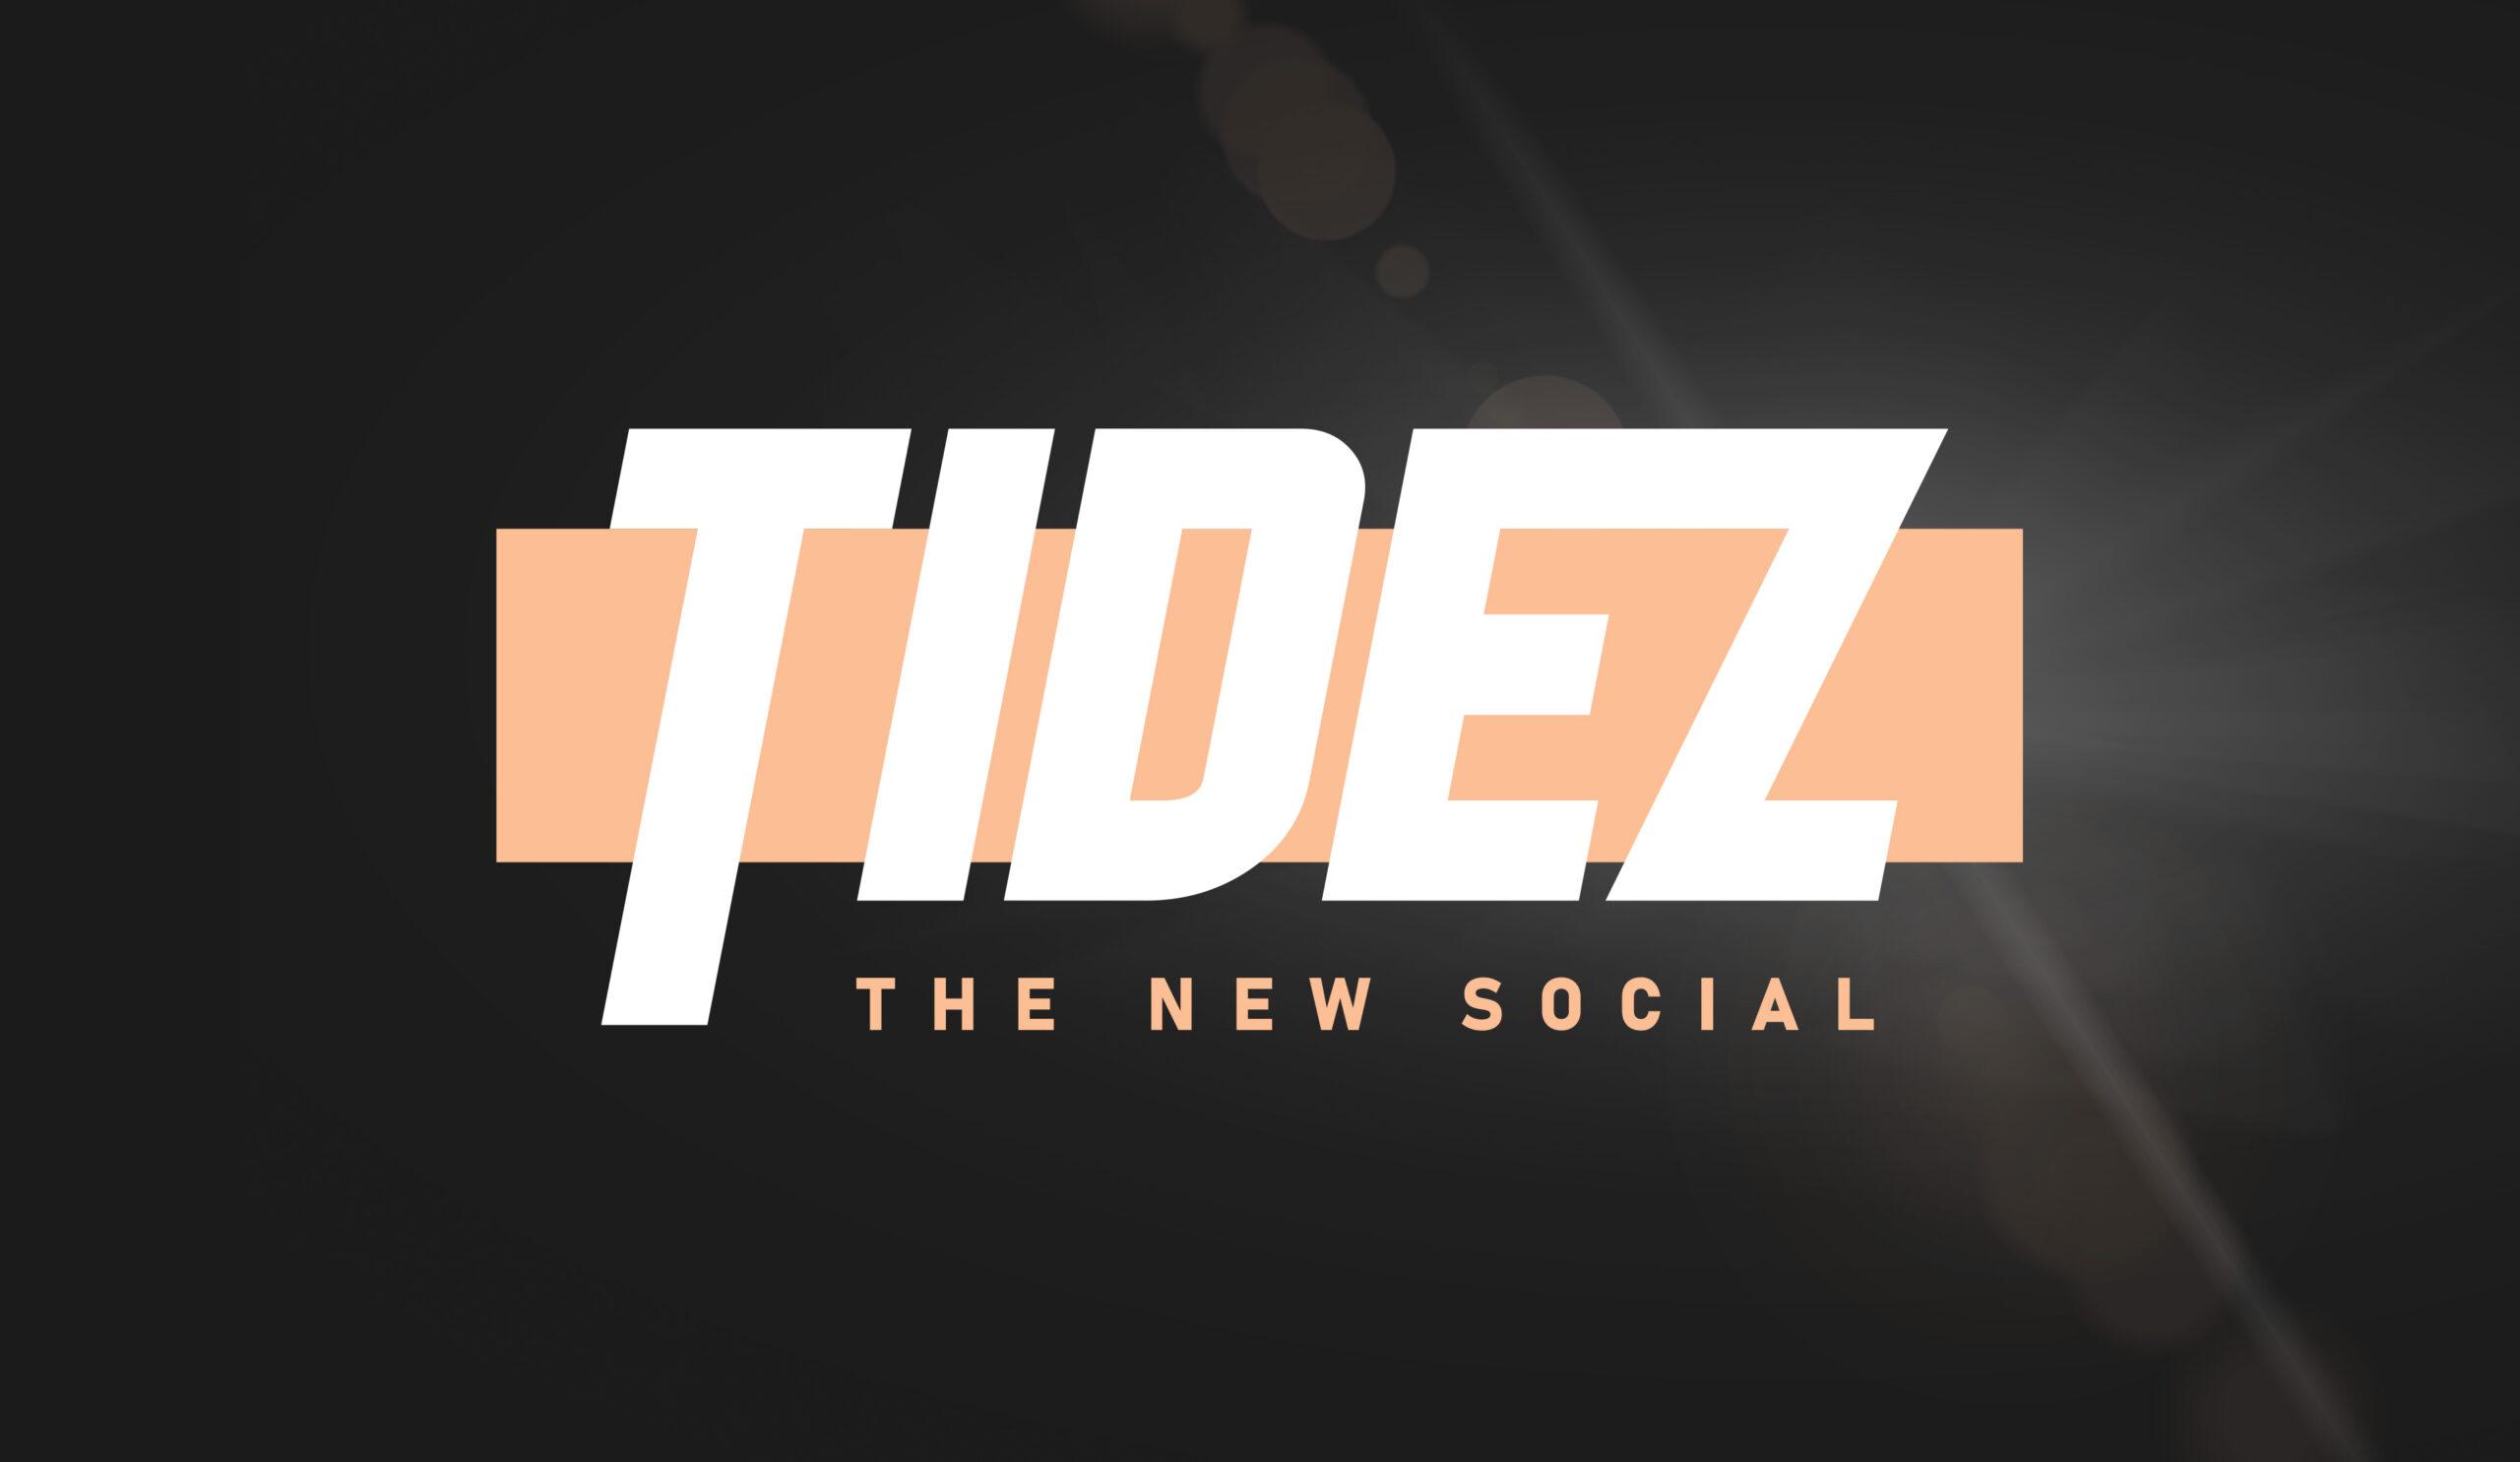 tidez logo